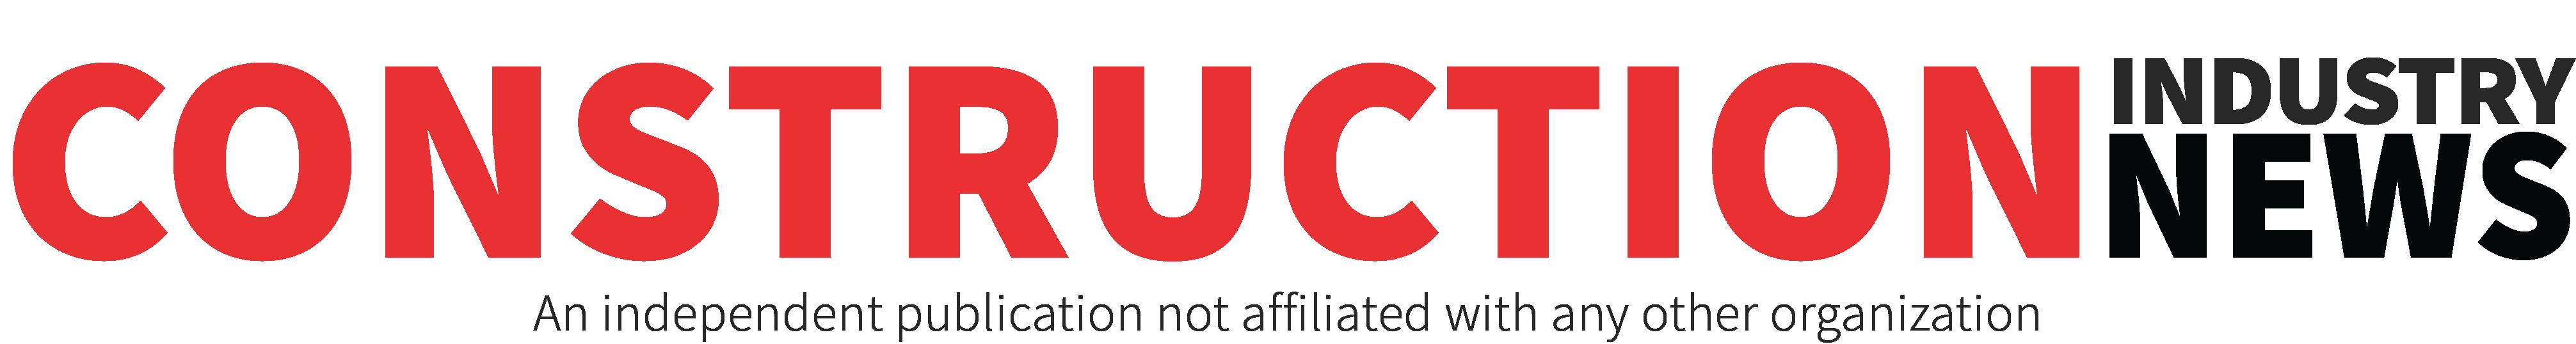 Construction Industry News logo